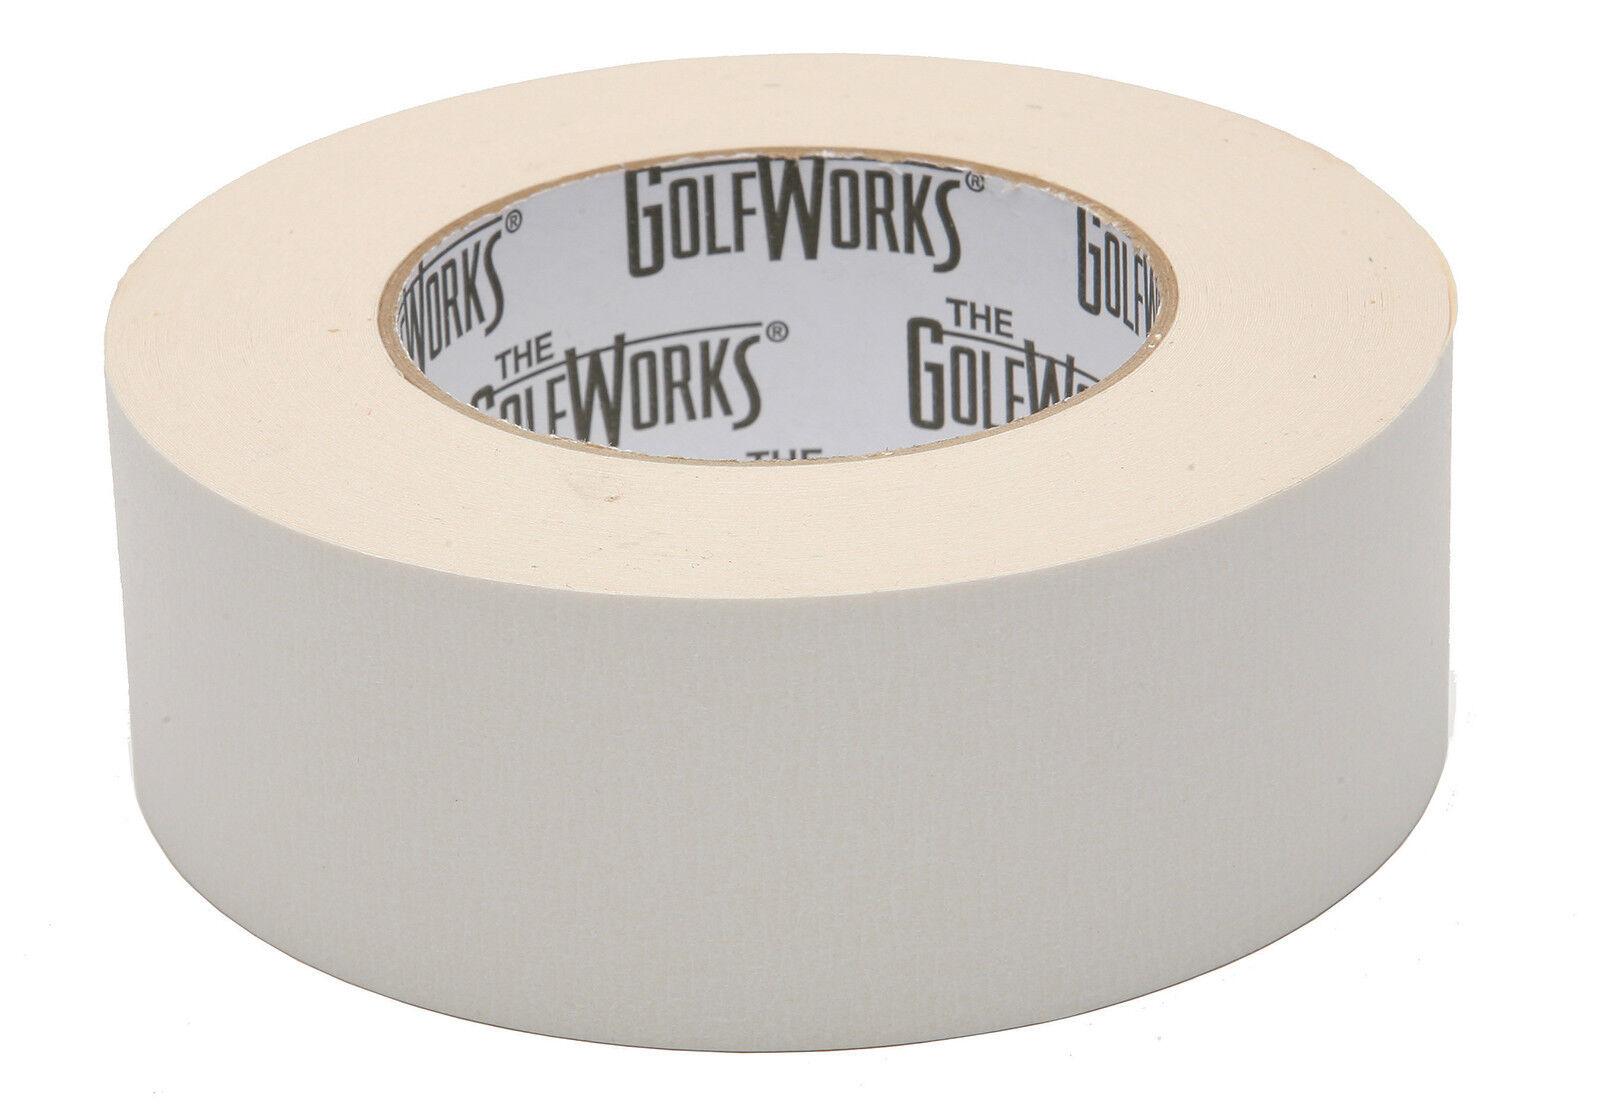 Professional Grip Tape - 48mm x 36 yd. Roll